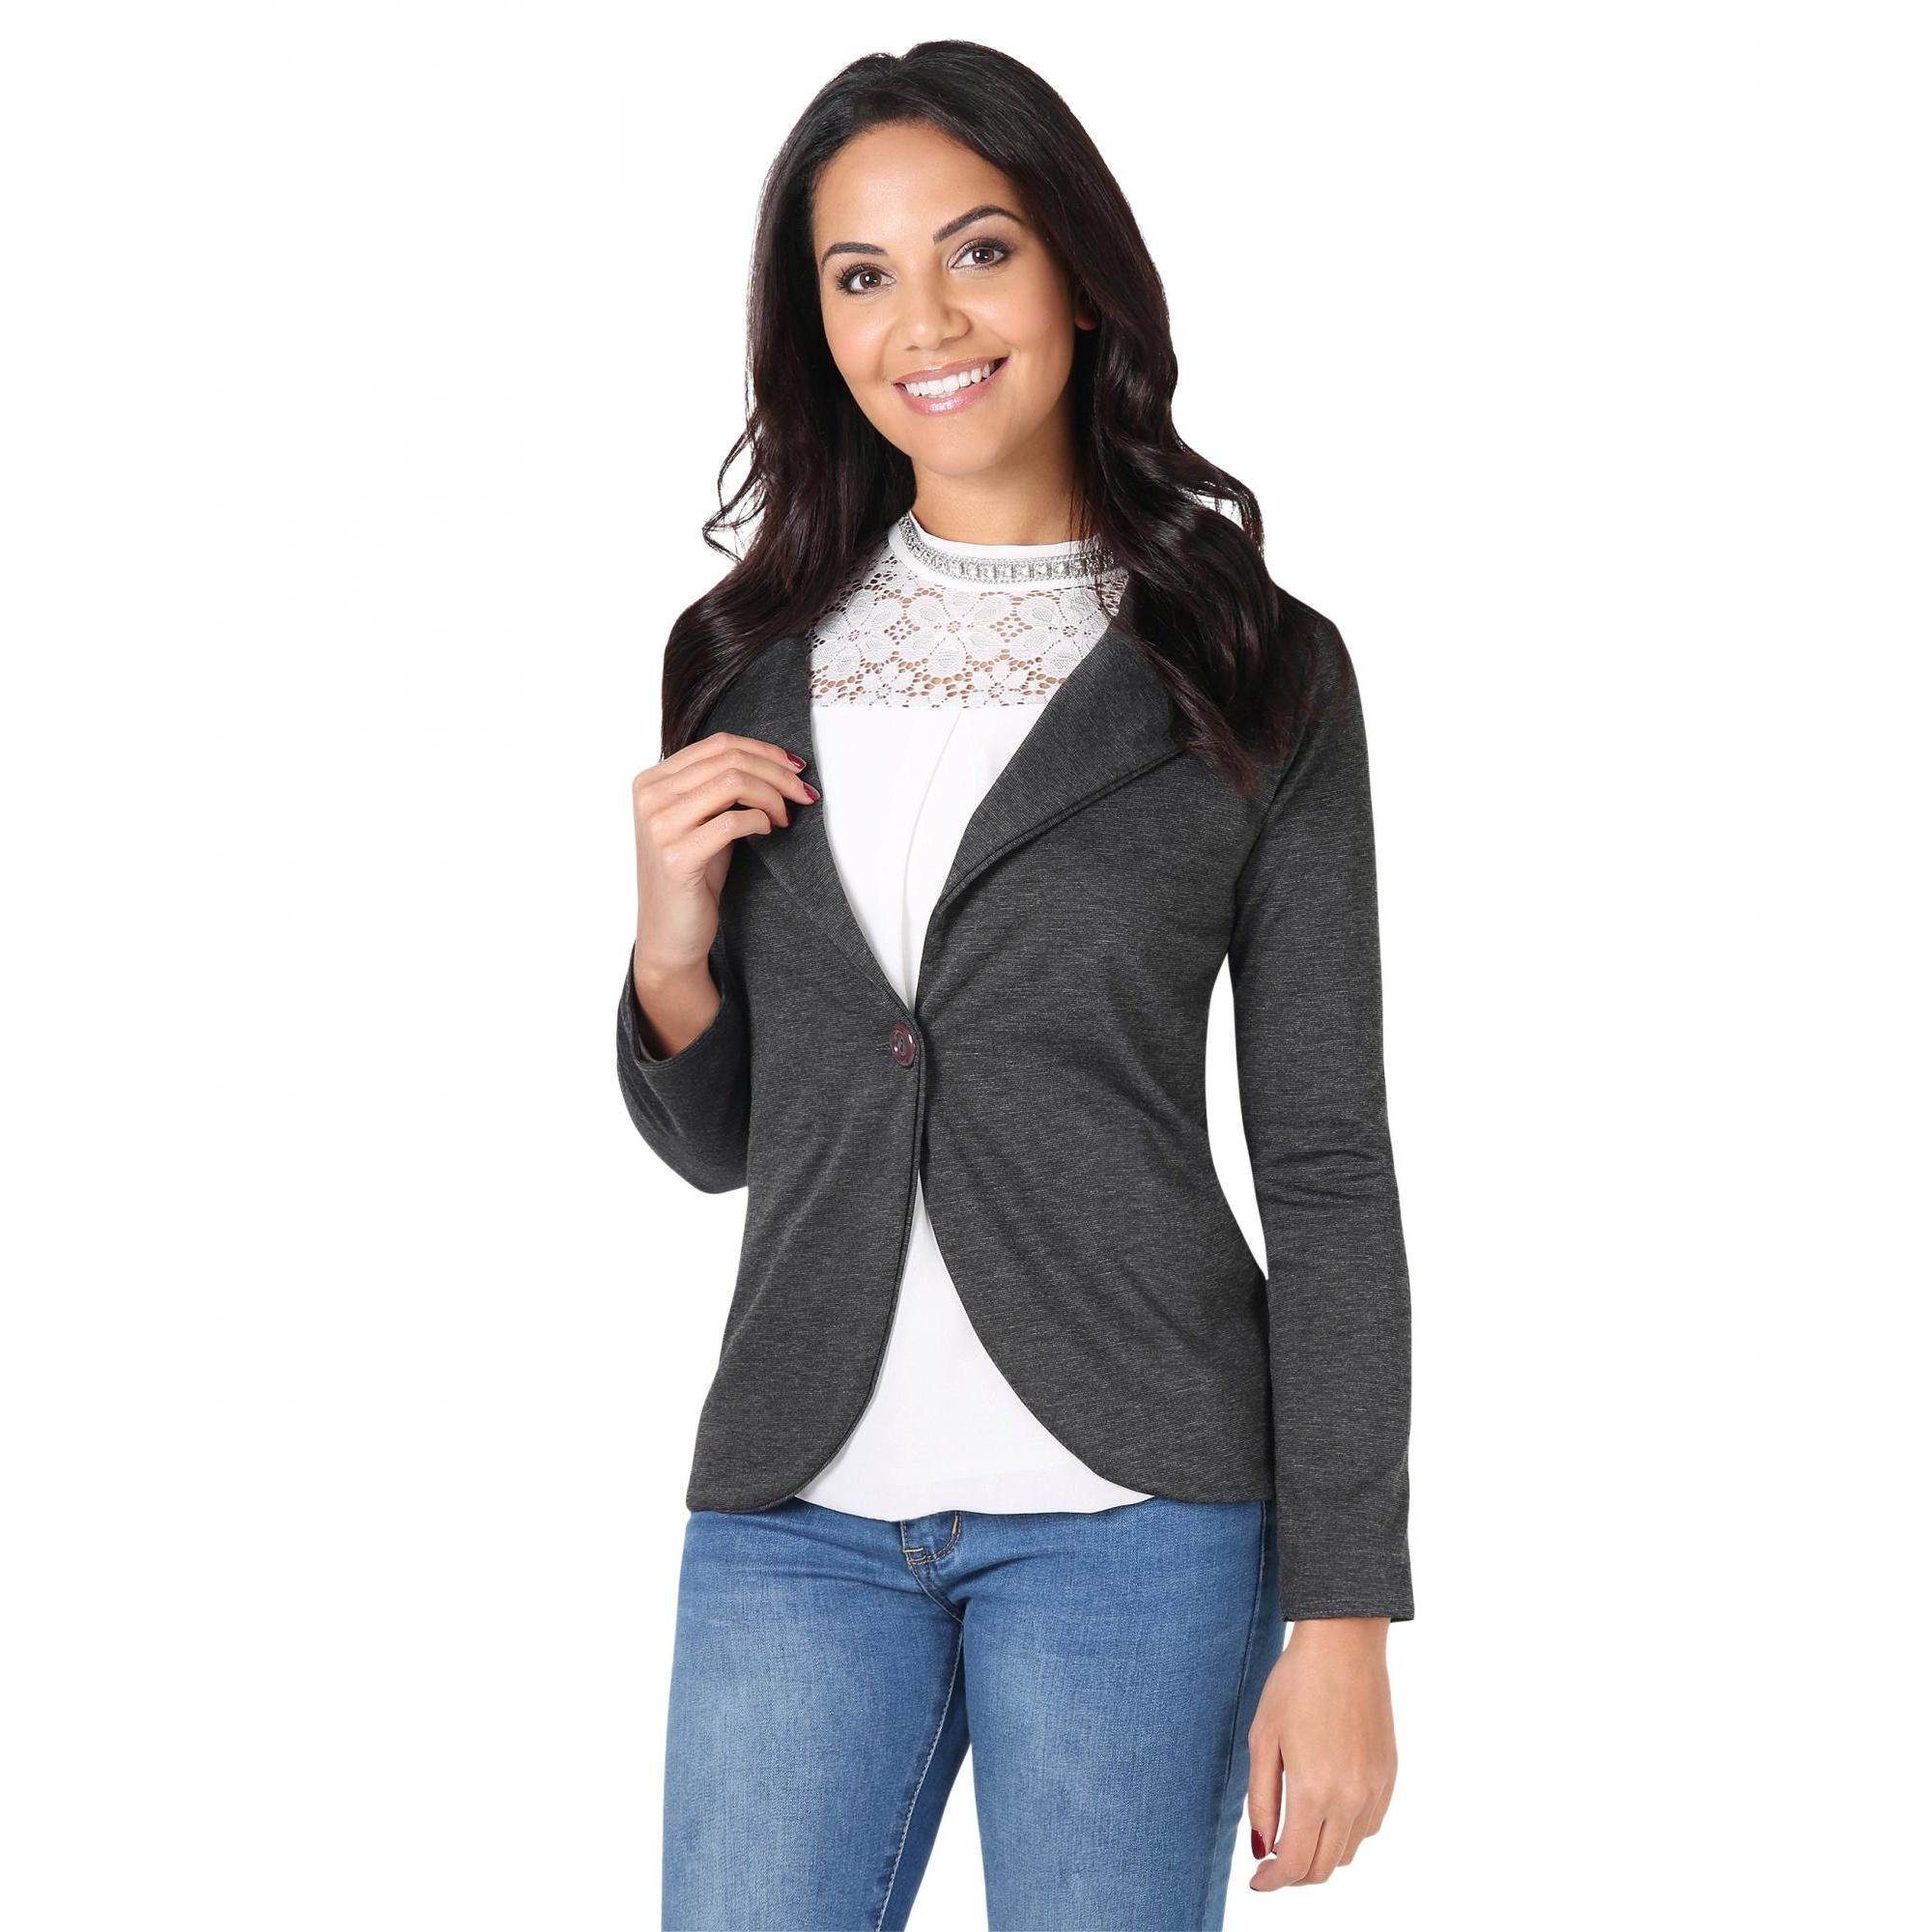 Krisp Basics Womens/Ladies Tailored One Button Blazer (14 UK) (Charcoal)